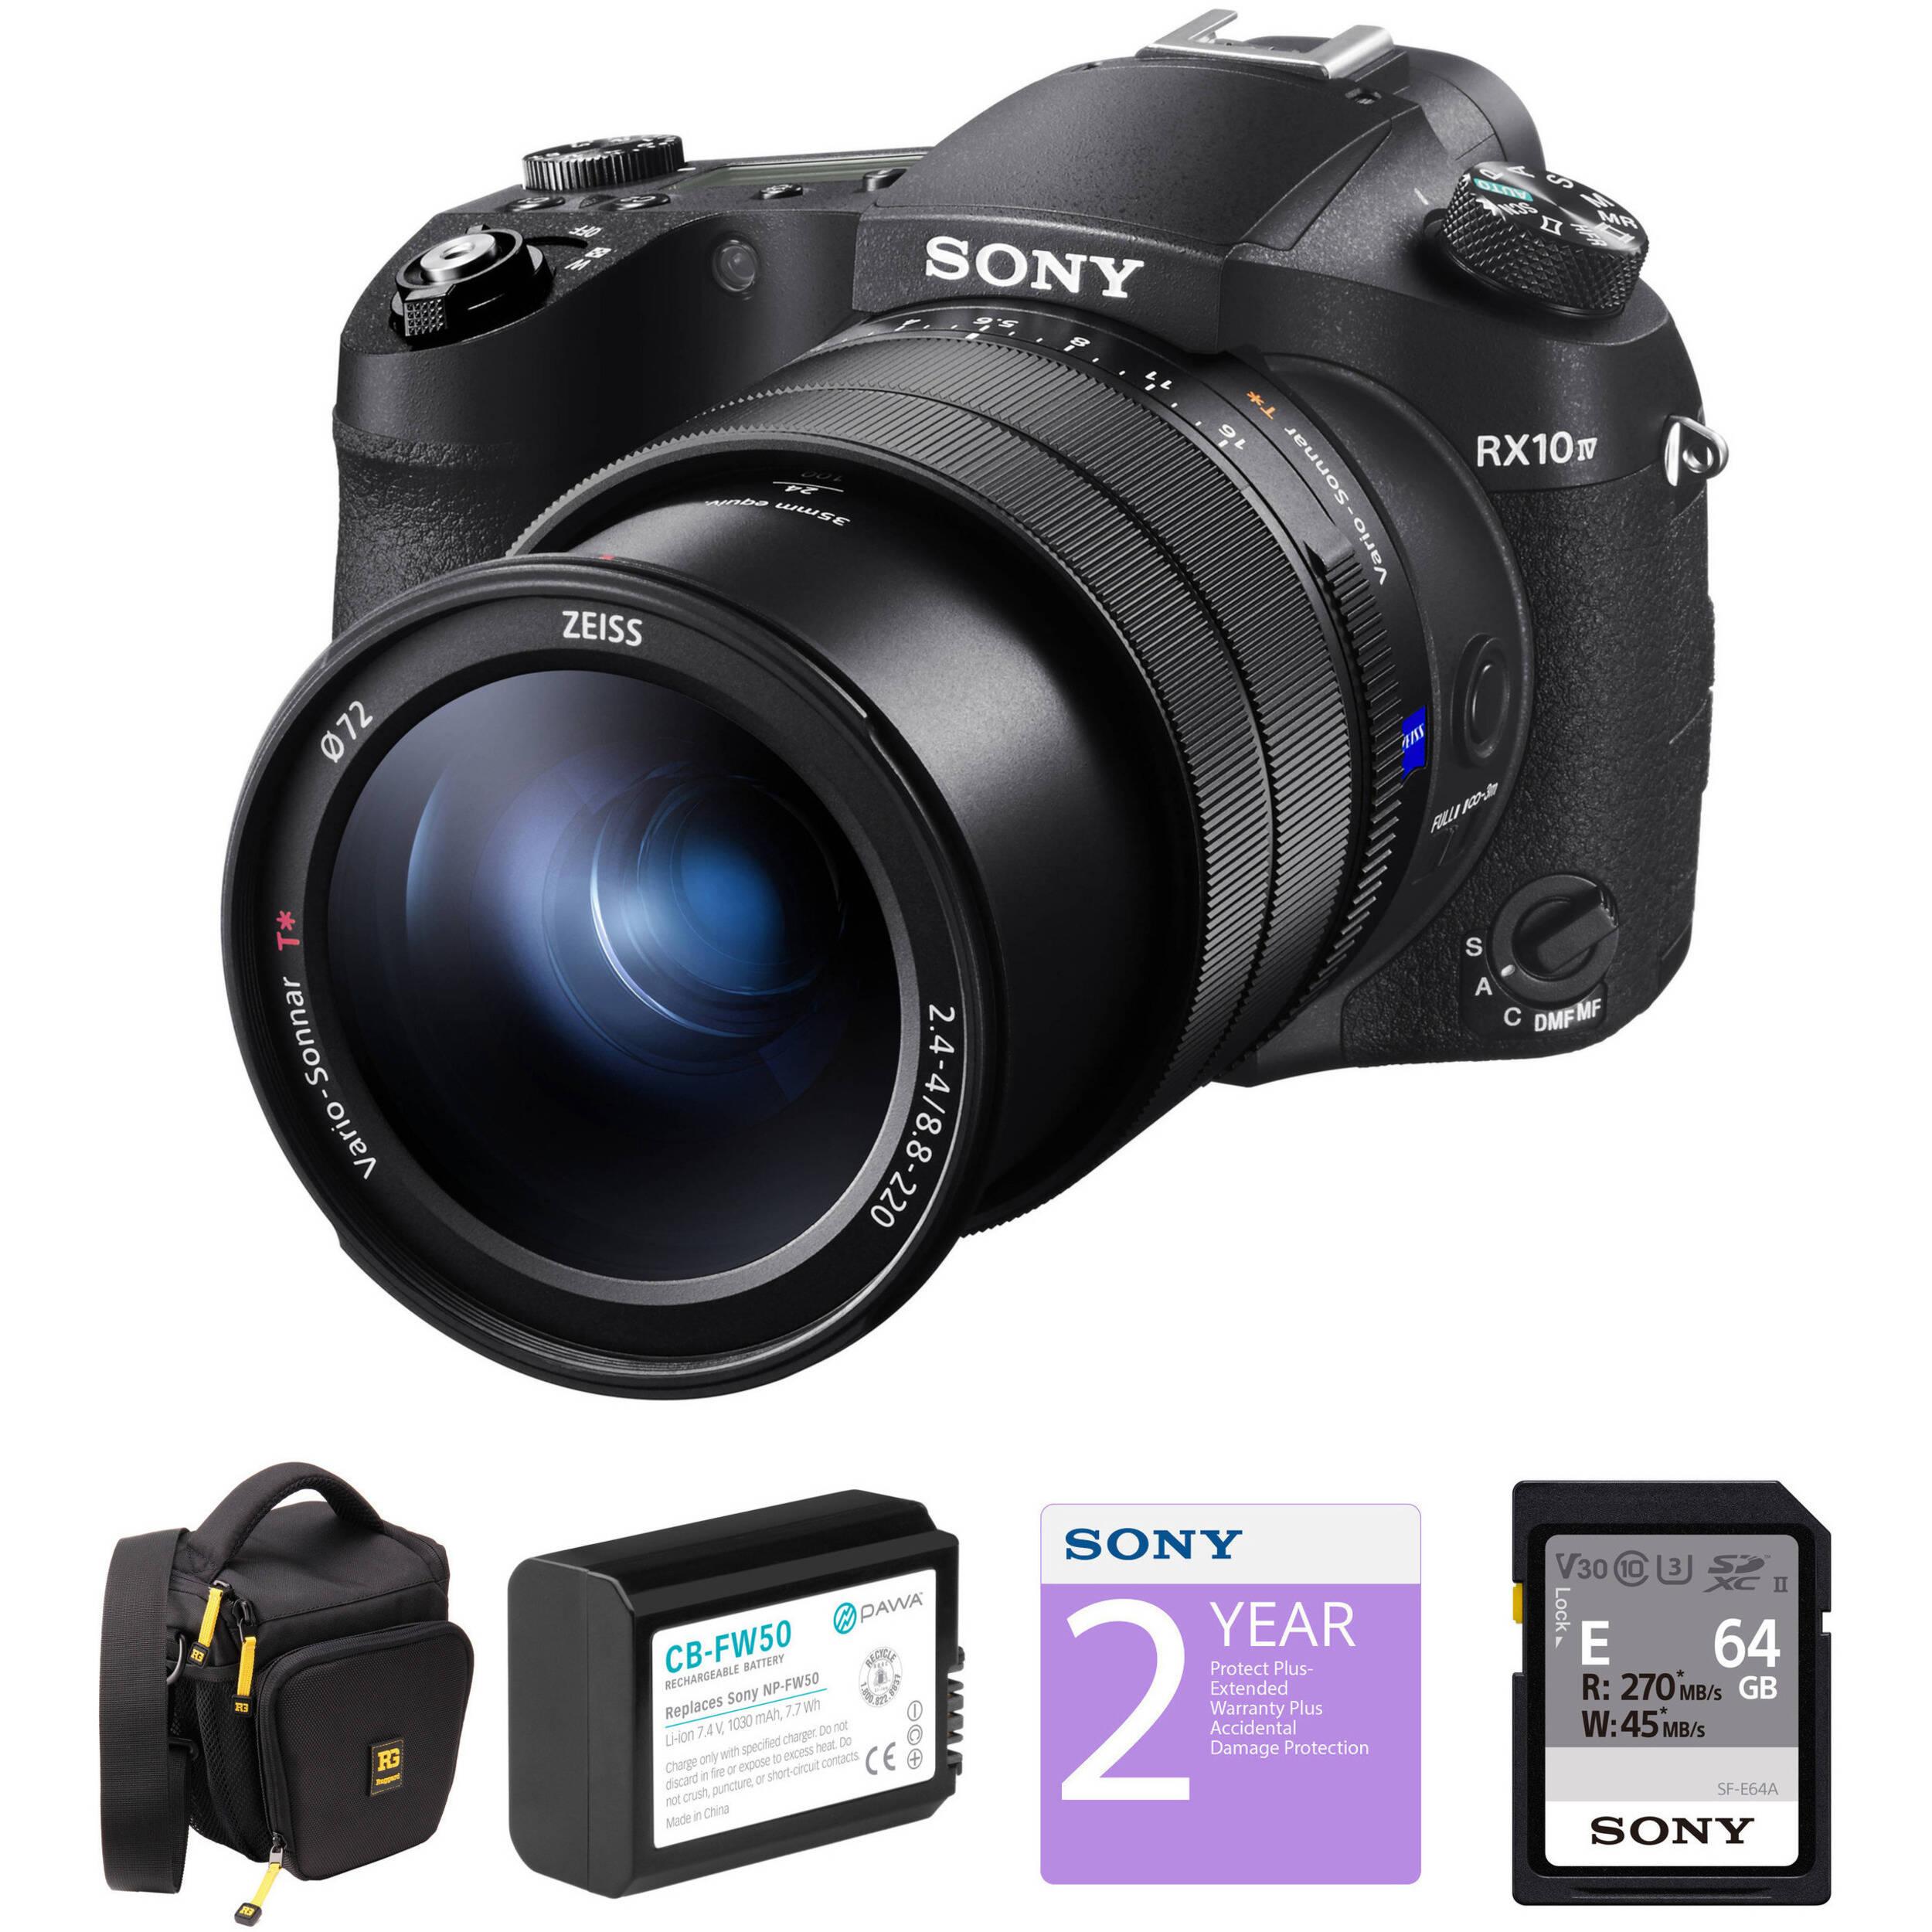 sony rx10 iv. sony cyber-shot dsc-rx10 iv digital camera deluxe kit rx10 iv n